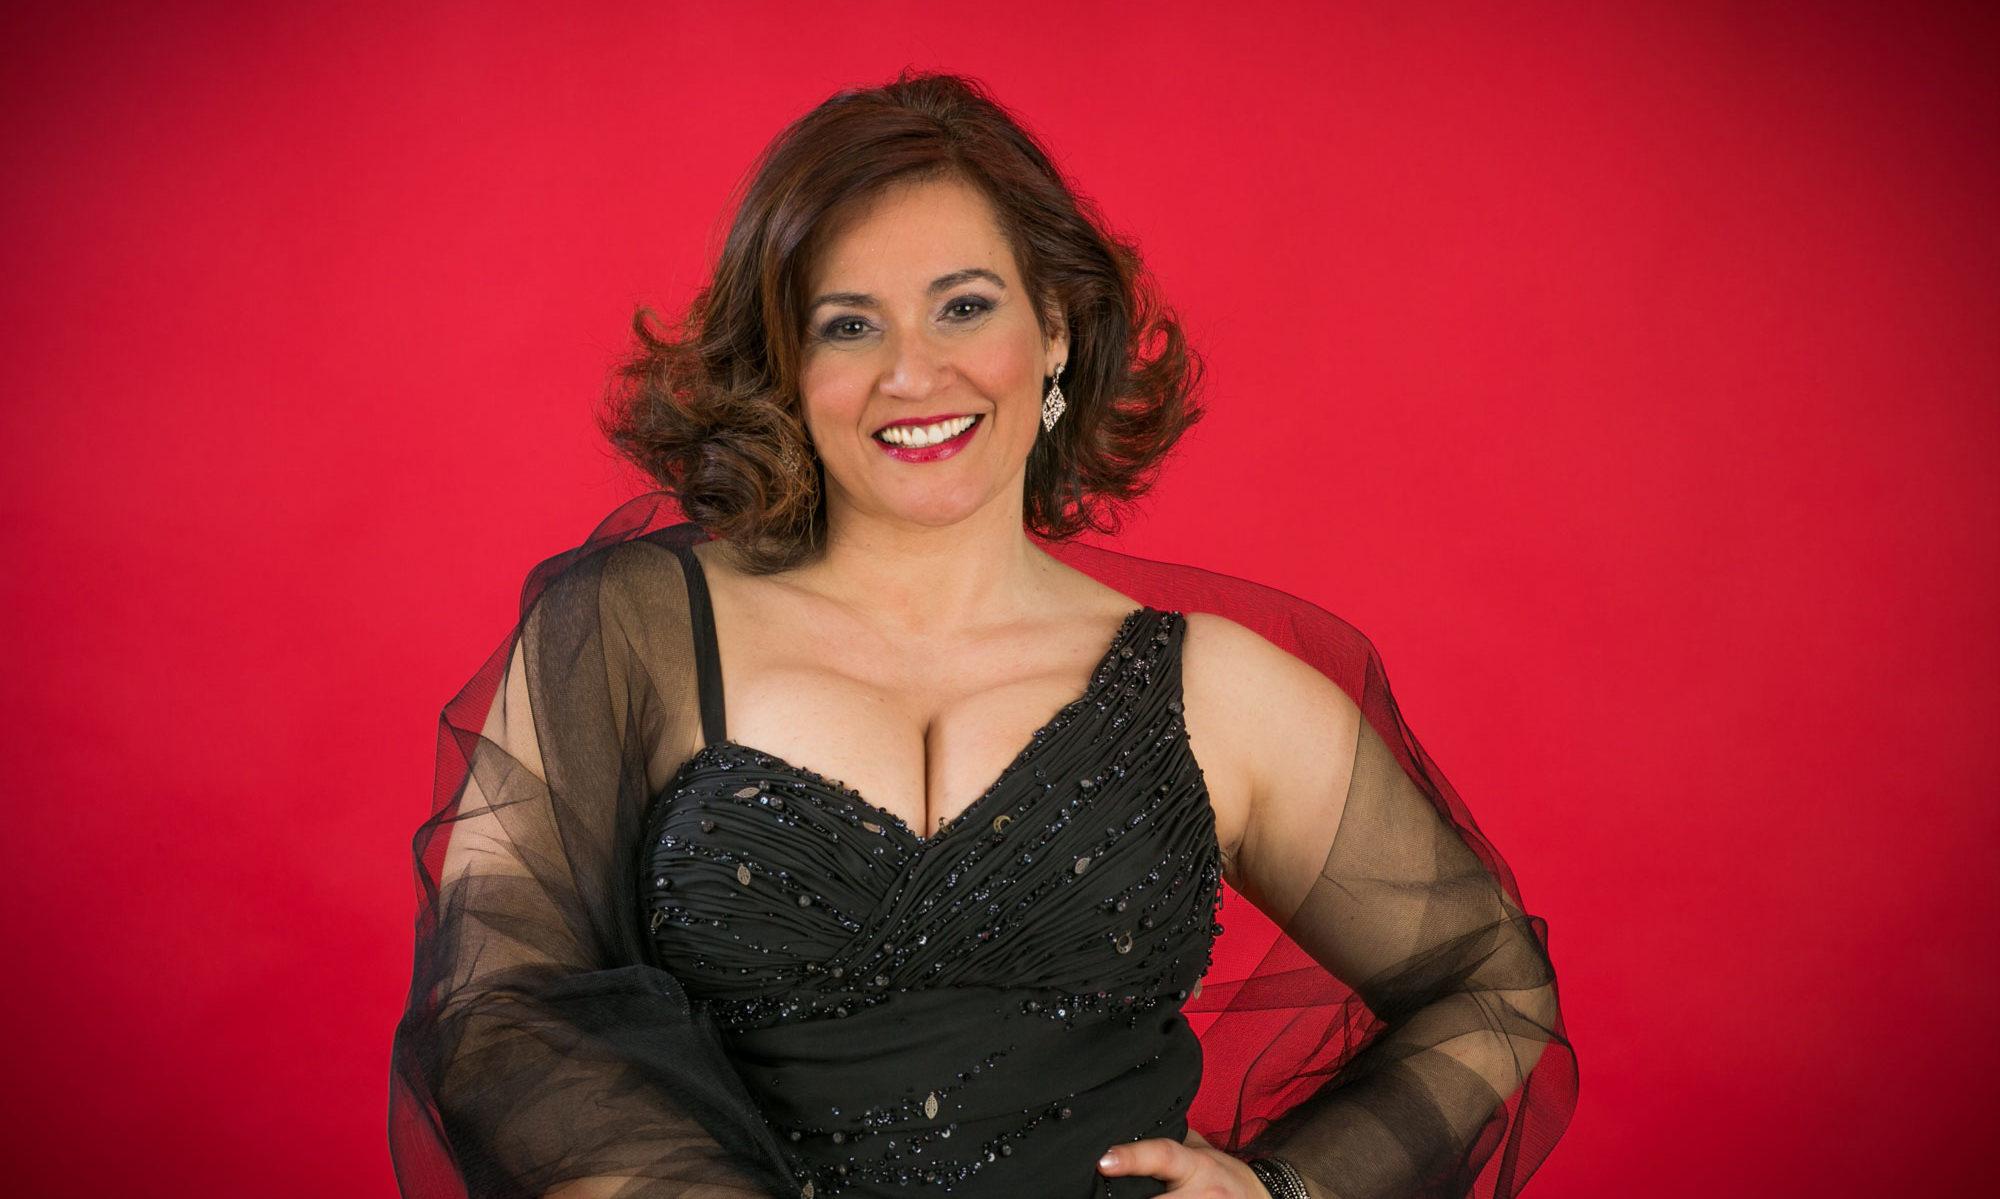 Laura Cherici